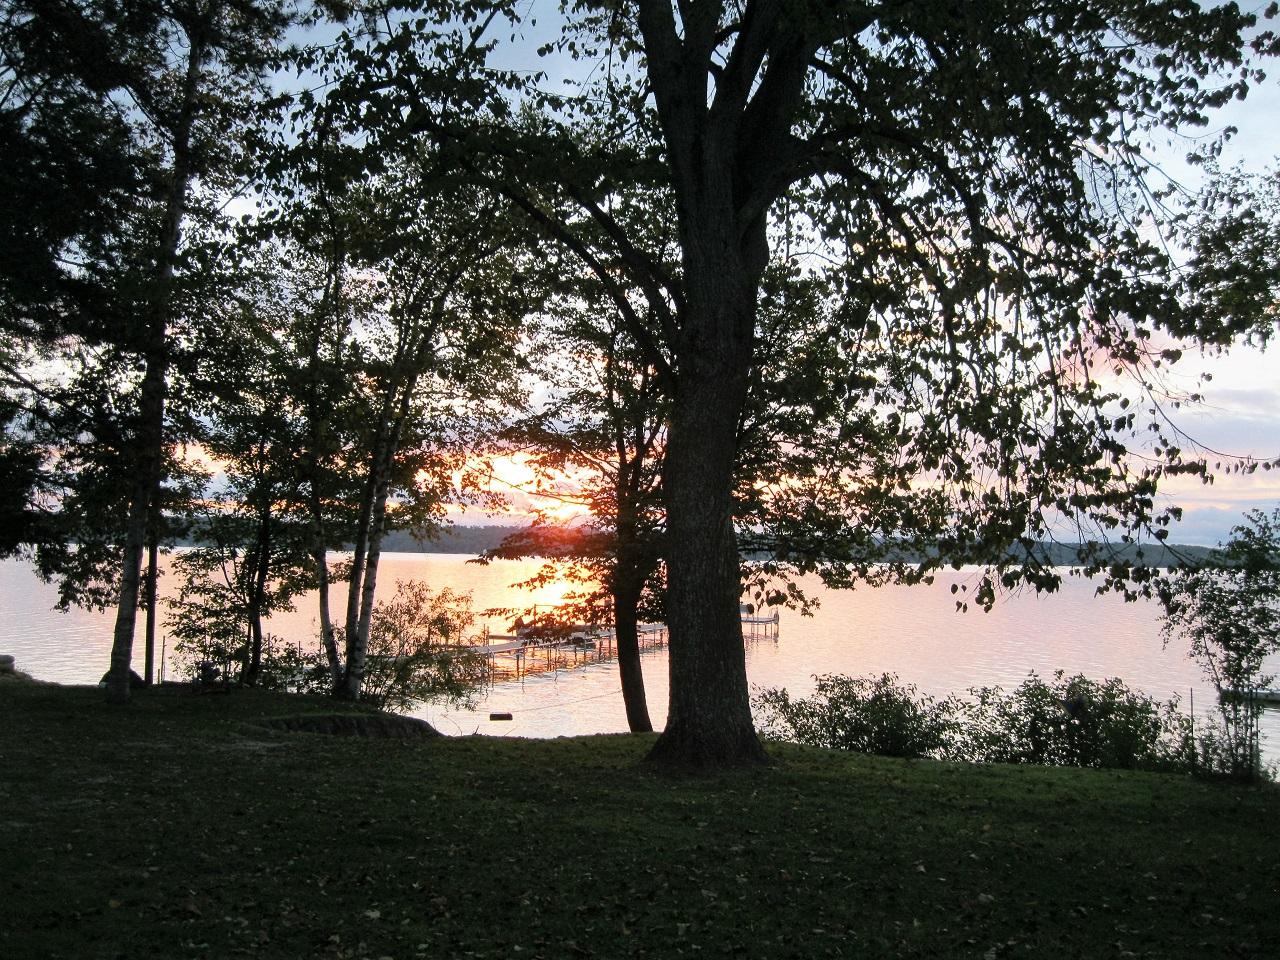 Beautiful sunrise over Leelanau's Rustic Resort